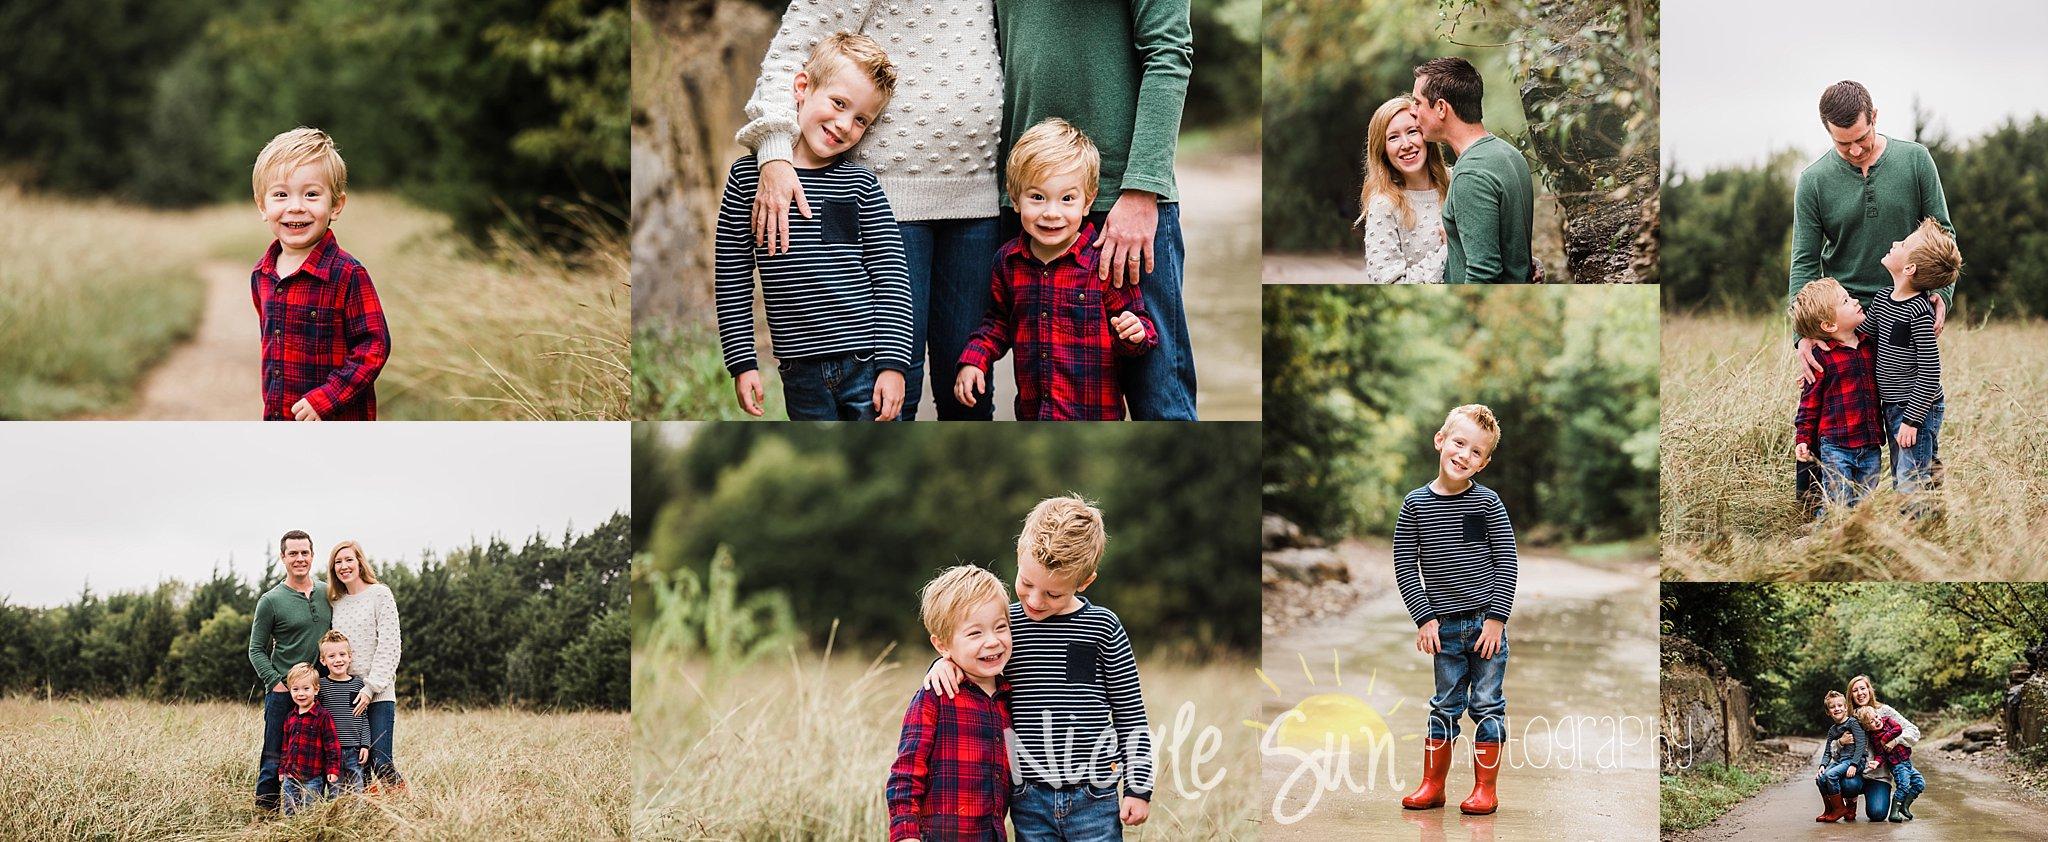 planofamilyphotographer.jpg